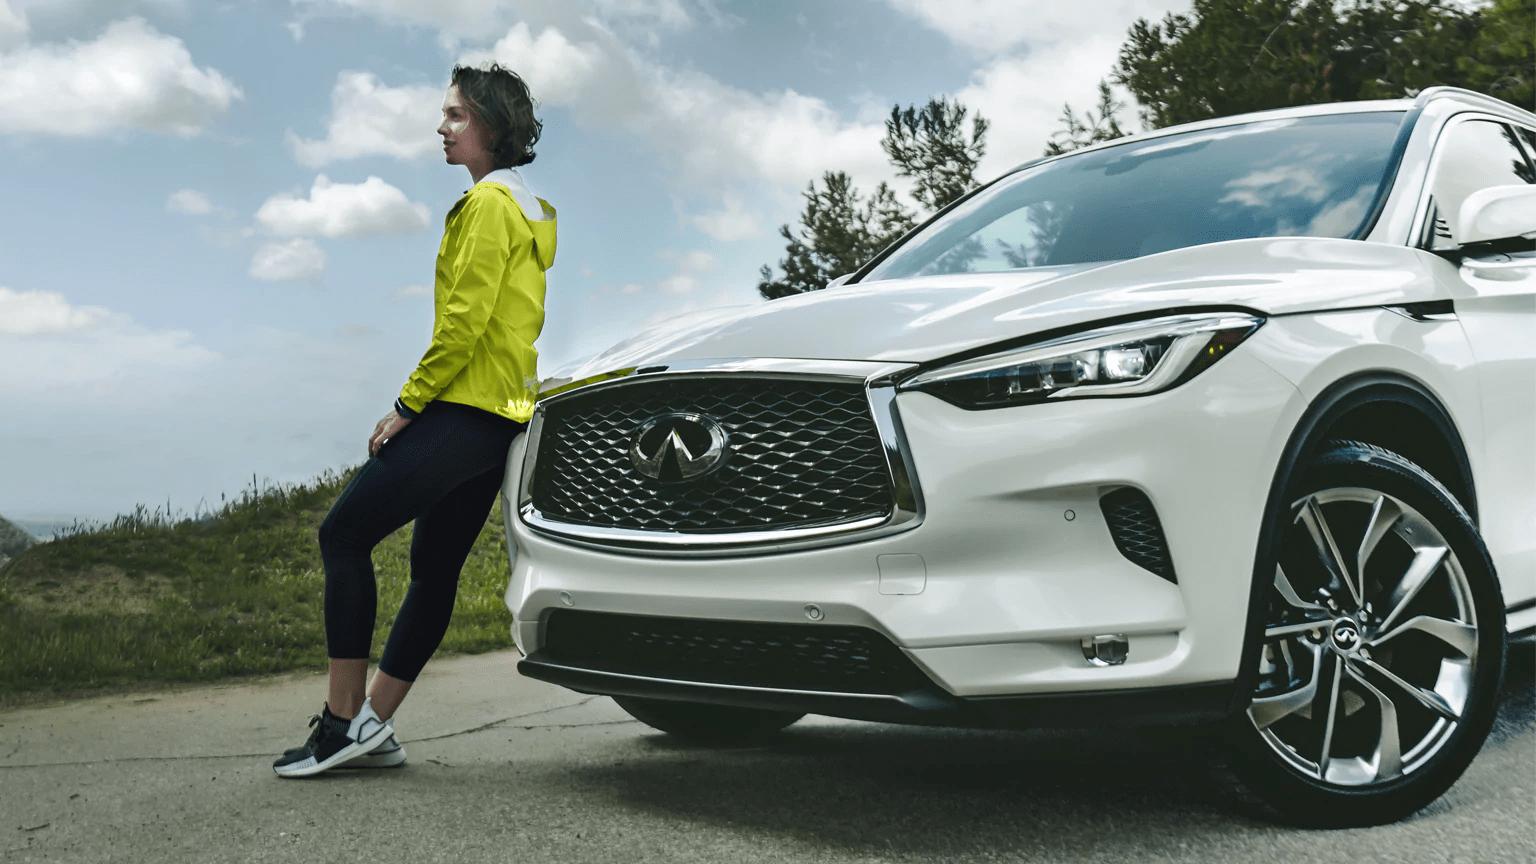 2020 INFINITI QX50 SUV parked